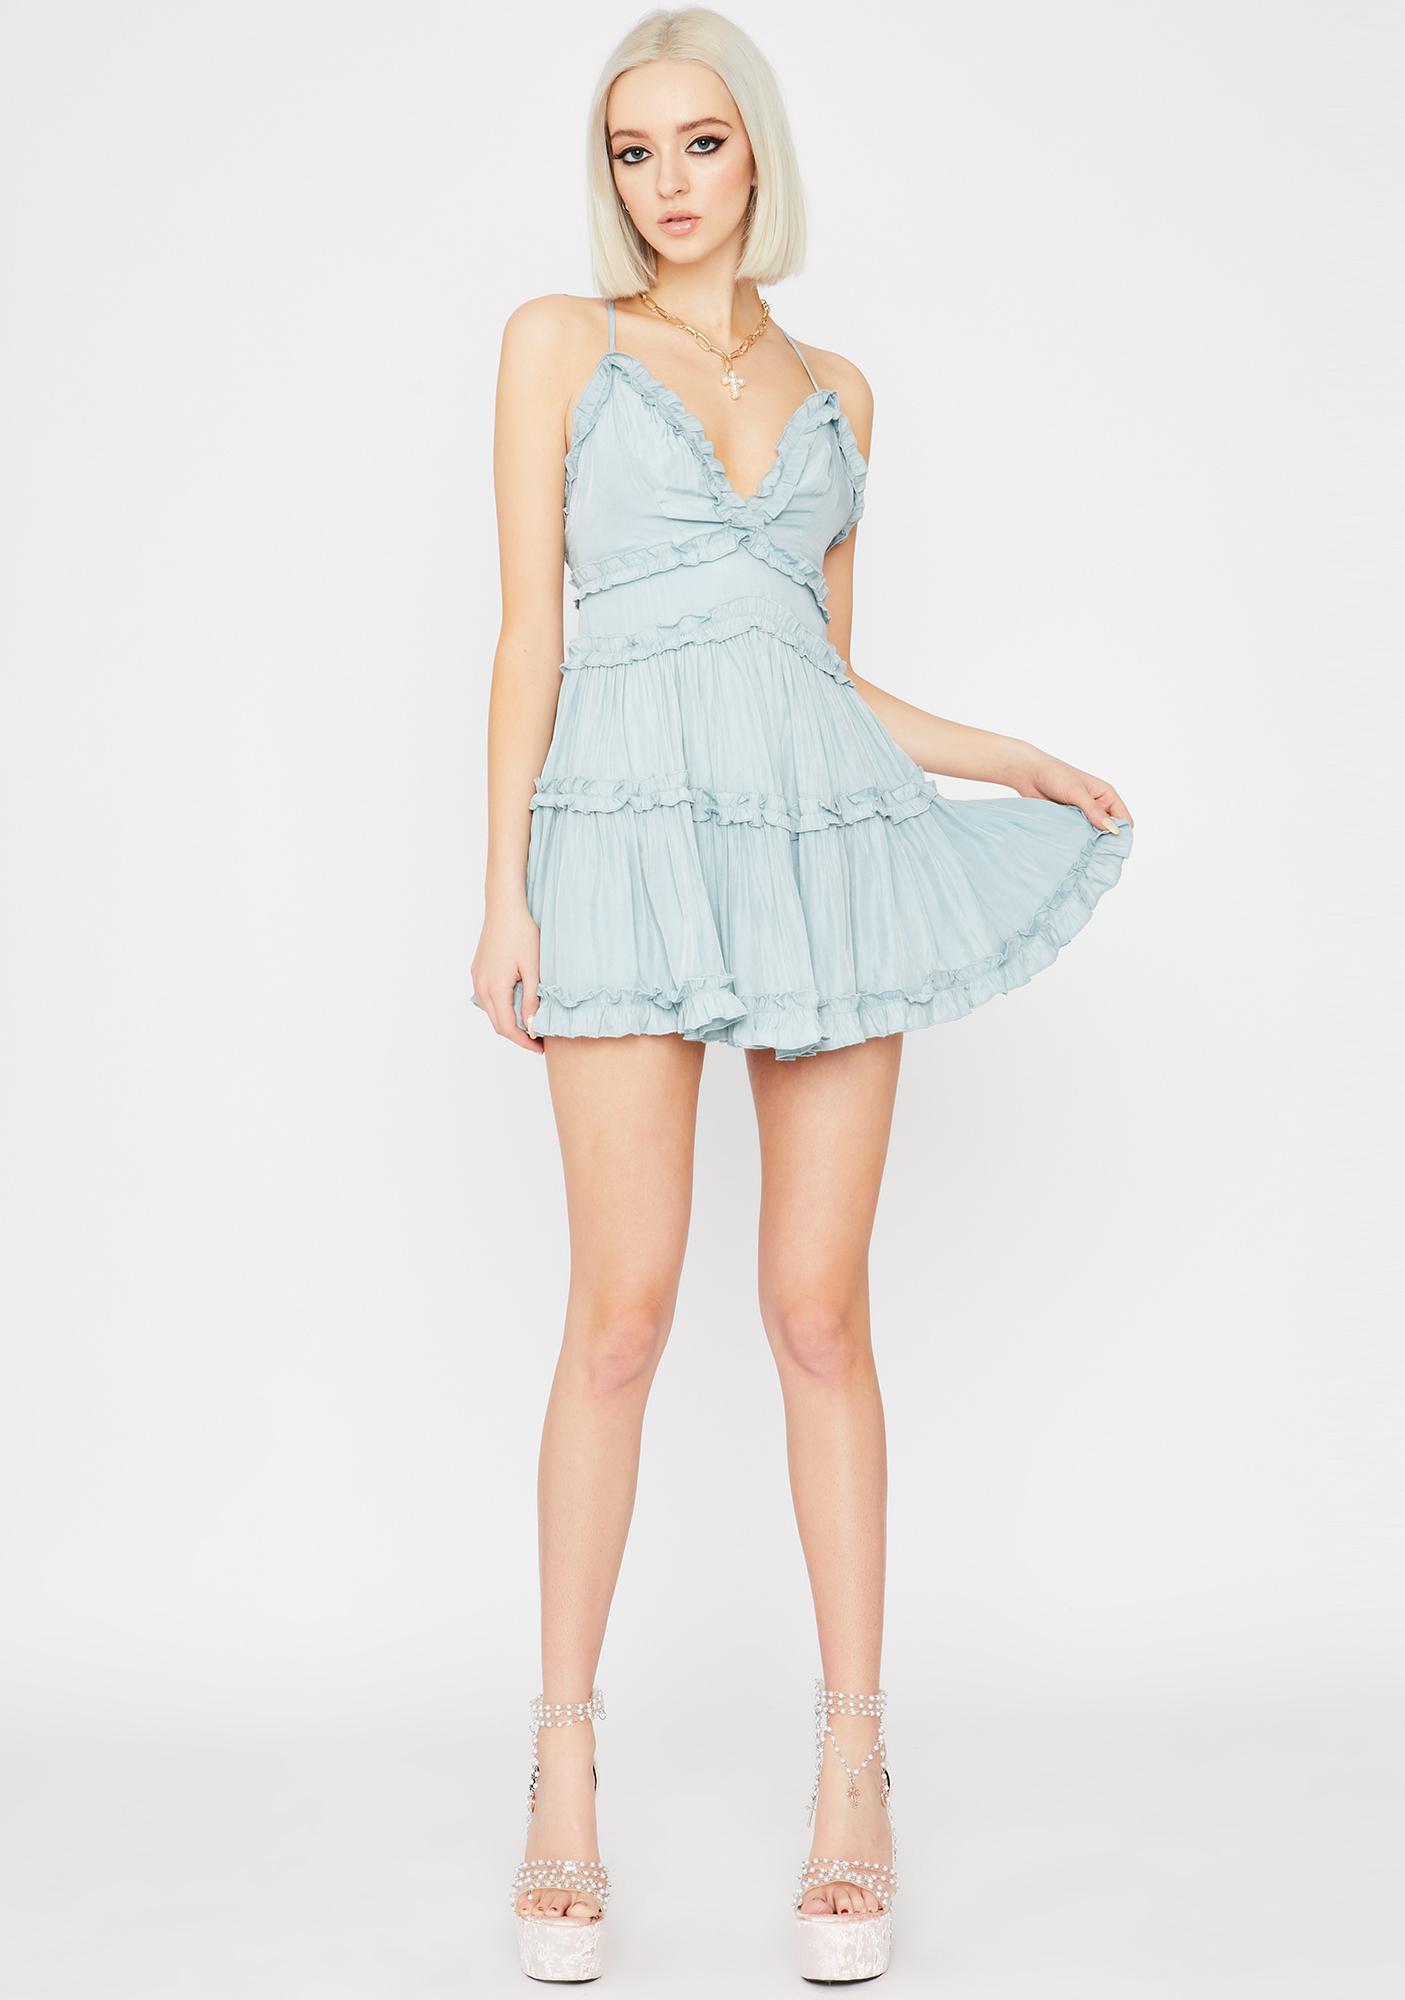 Sky Ruffle Me Up Mini Dress